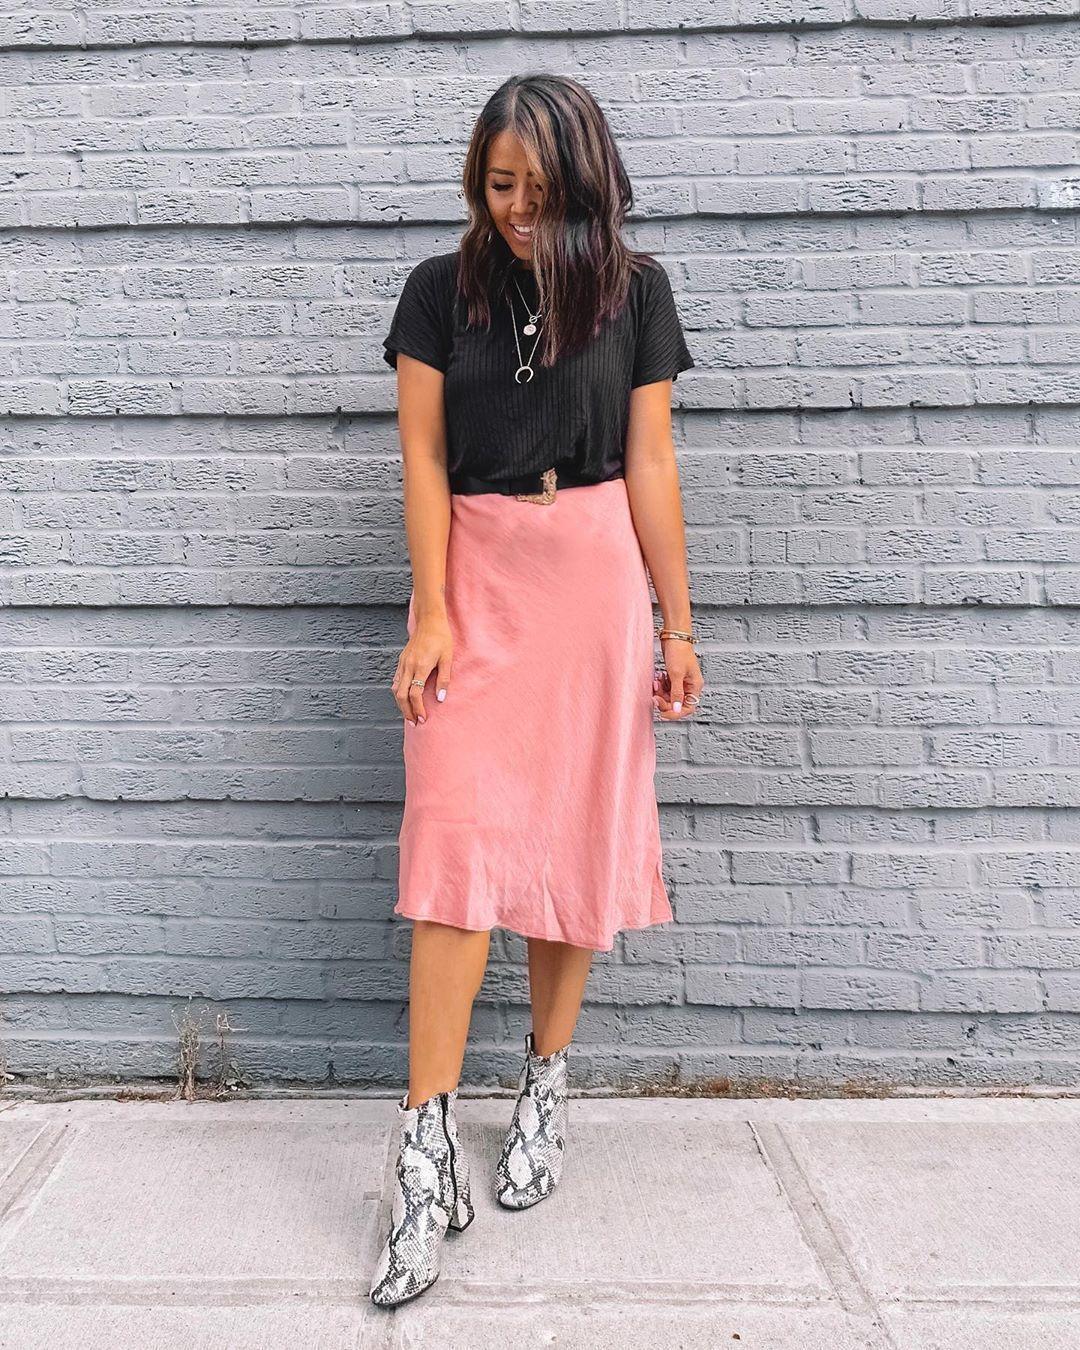 Skirt 14 At Walmart Com Wheretoget Pink Skirt Outfits Fashion Walmart Fashion